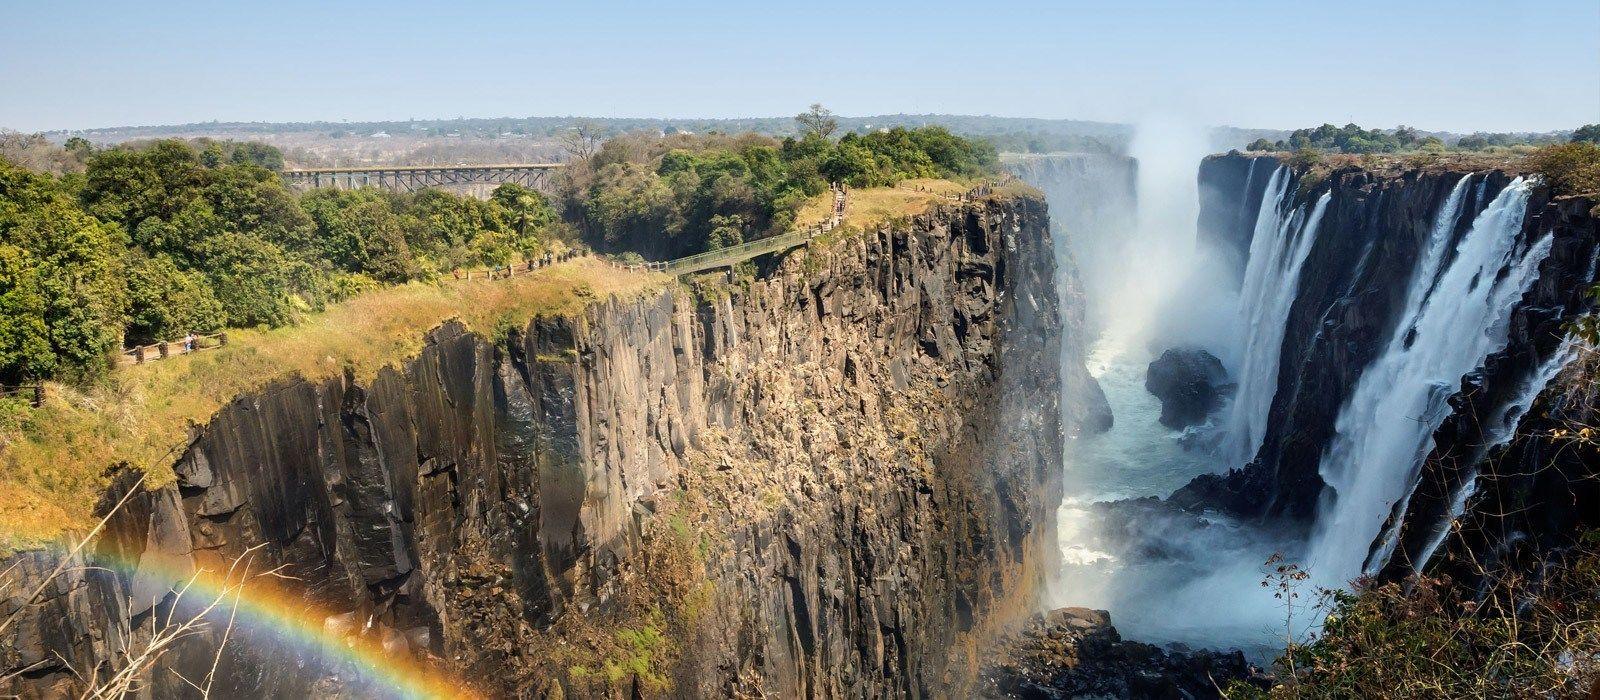 Botswana and Zambia: Luxury Safari and Victoria Falls Tour Trip 2